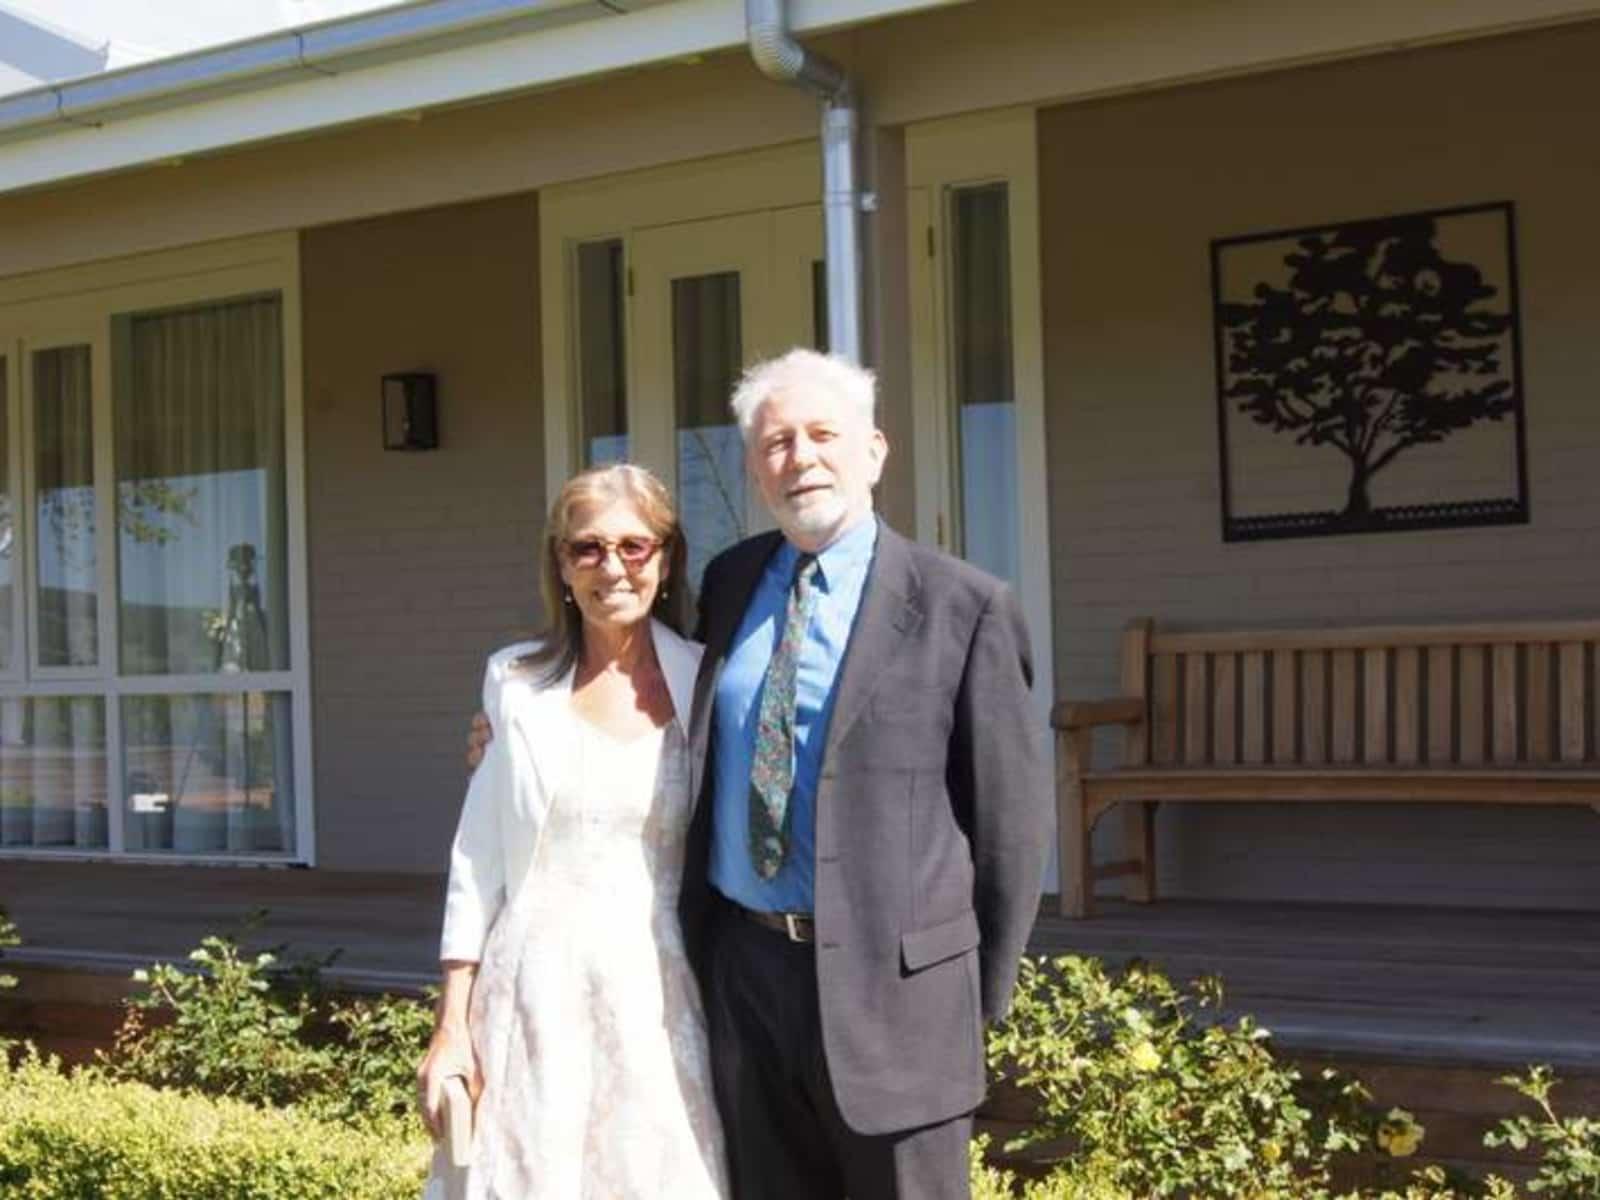 Andrea & Steve from Warrandyte, Victoria, Australia